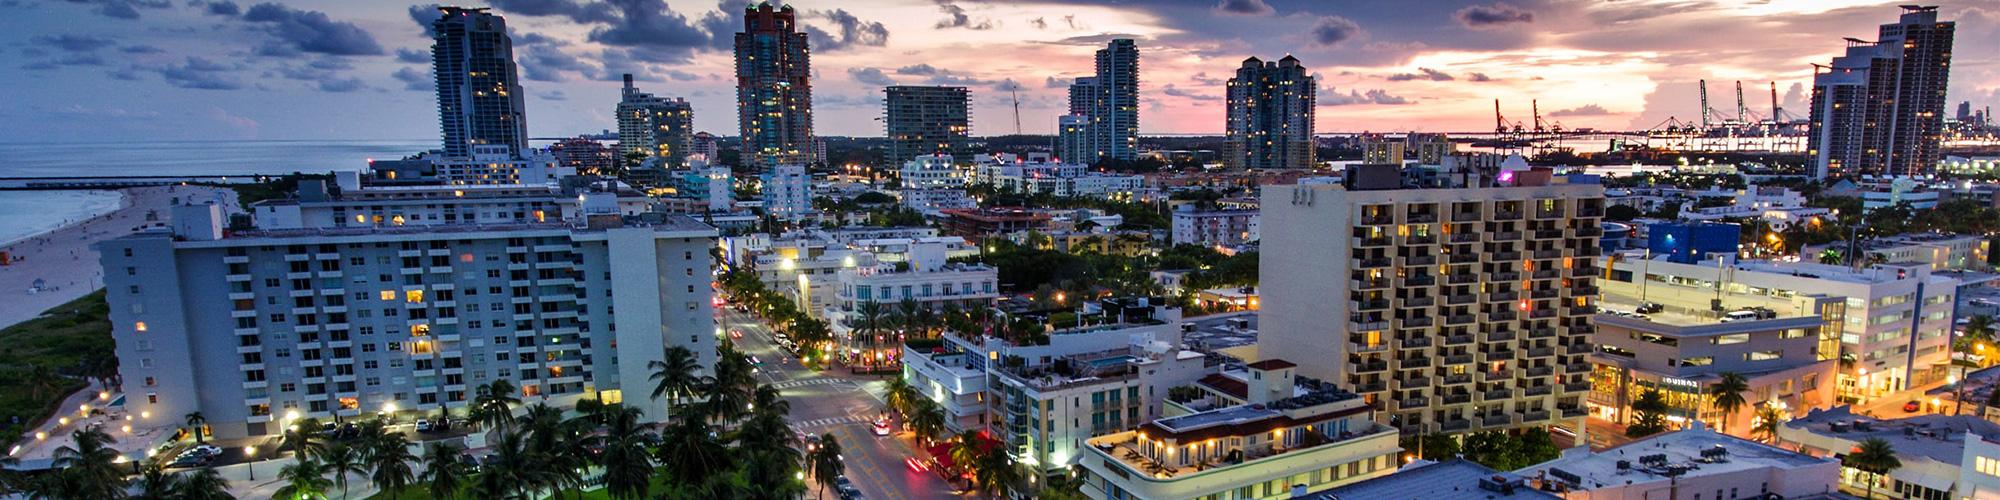 Miami Beach Hotel Area Rugs Royal